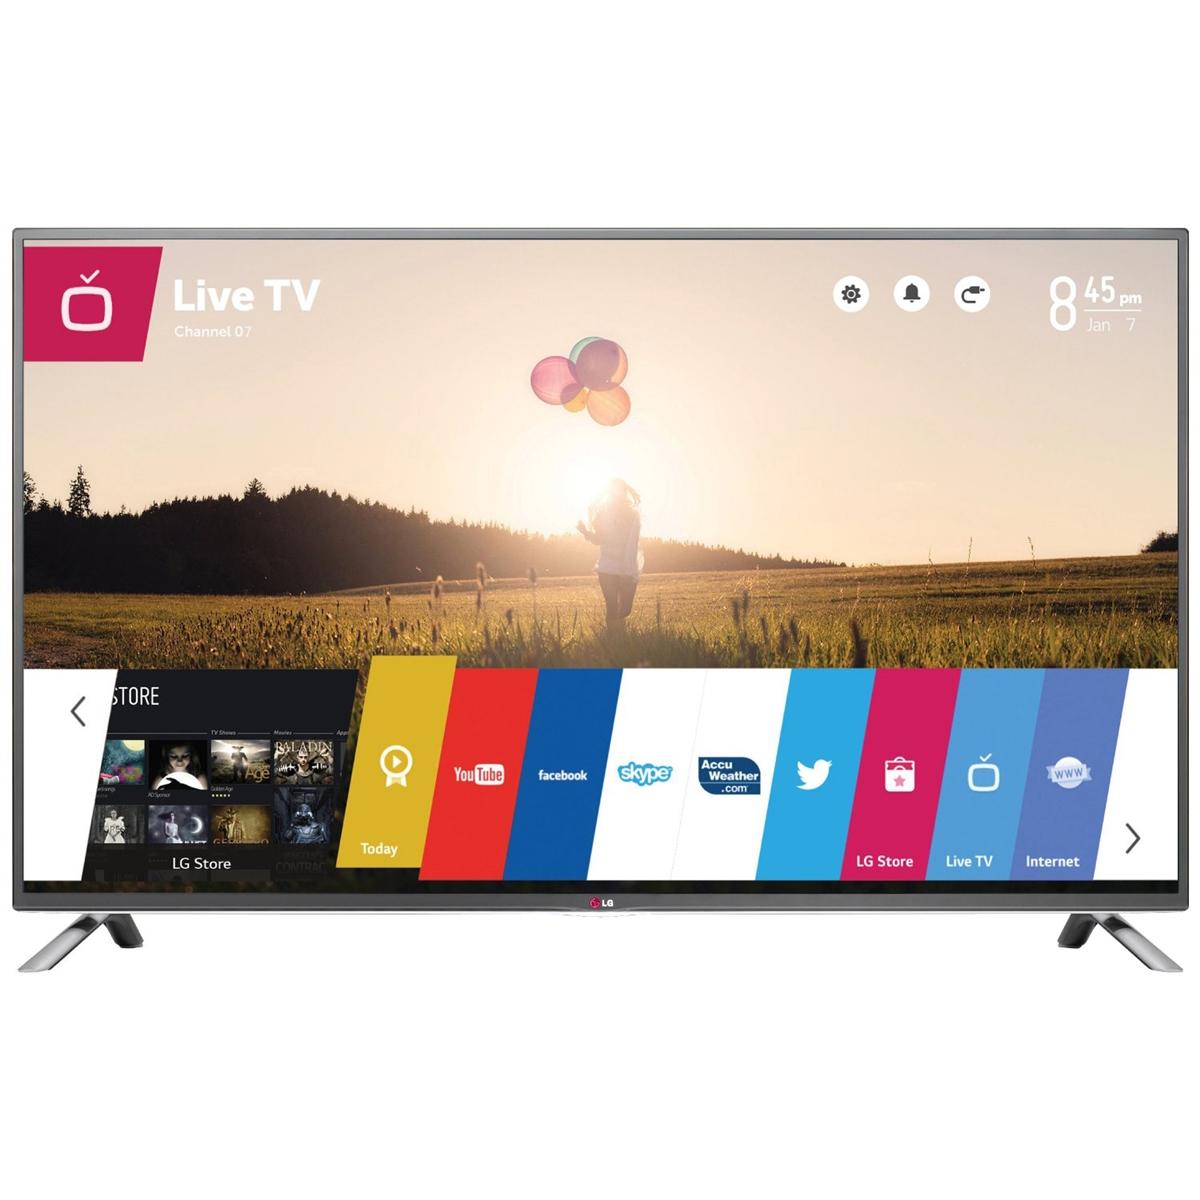 LG 70inch 7100 Series LED HDTV - 70LB7100